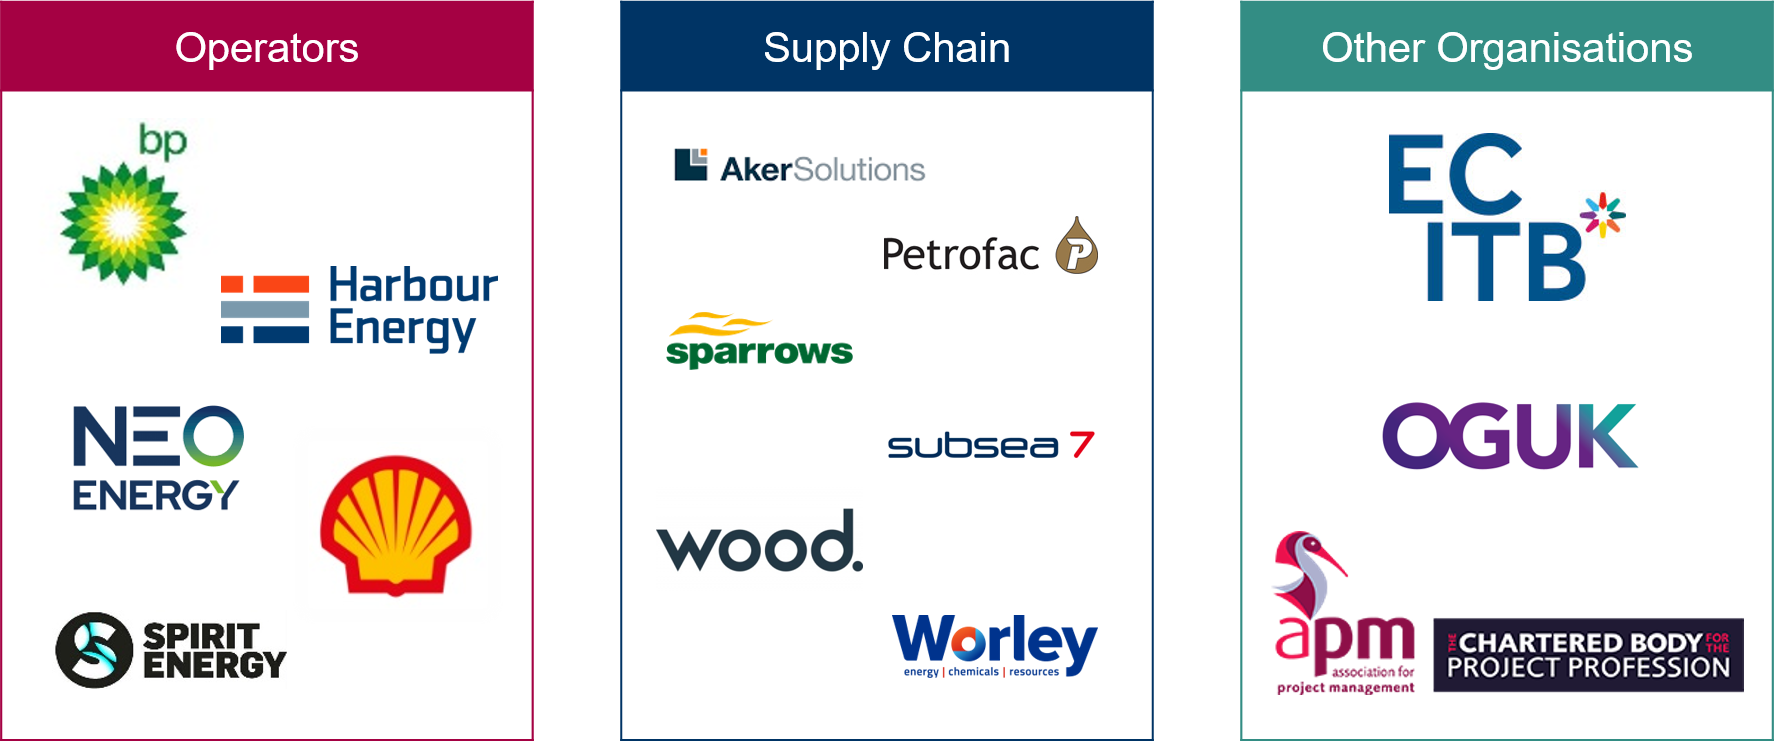 Members of the PMSG include BP, Harbour Energy, Neo Energ